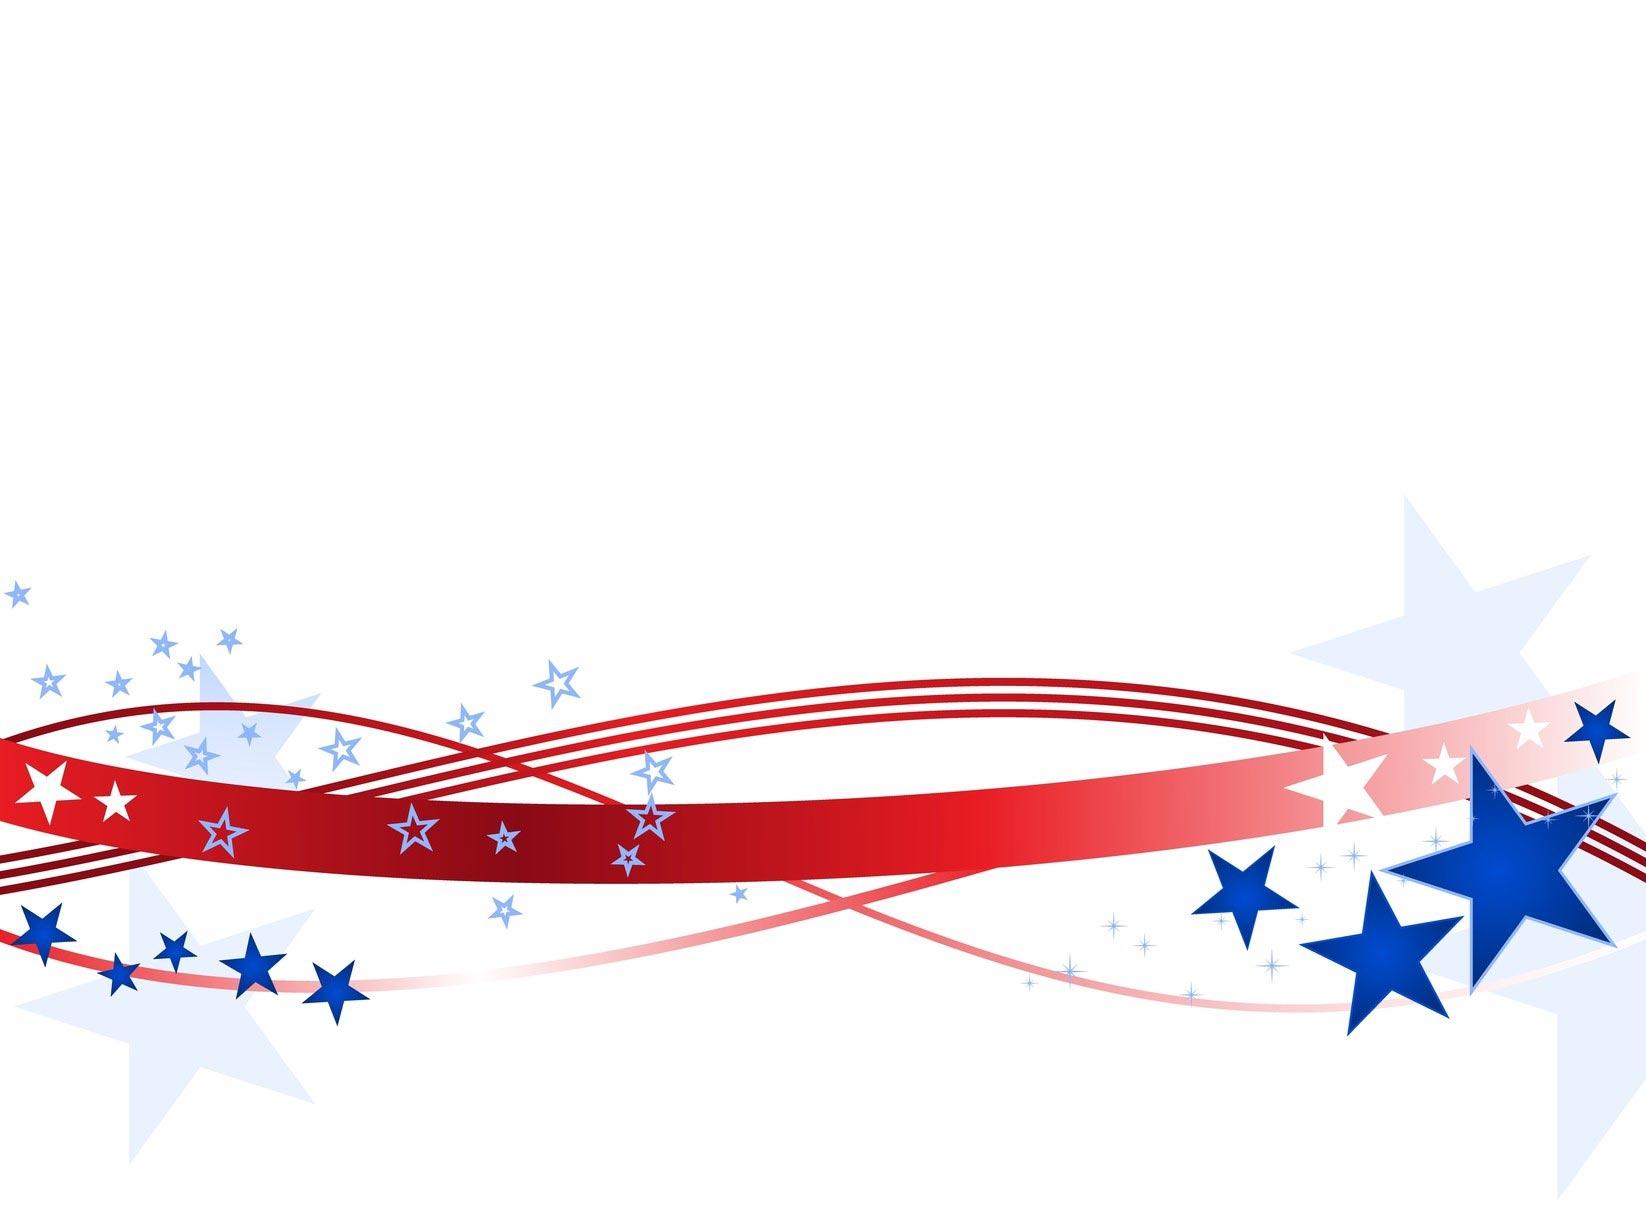 Patriotic Background Images Clipart.